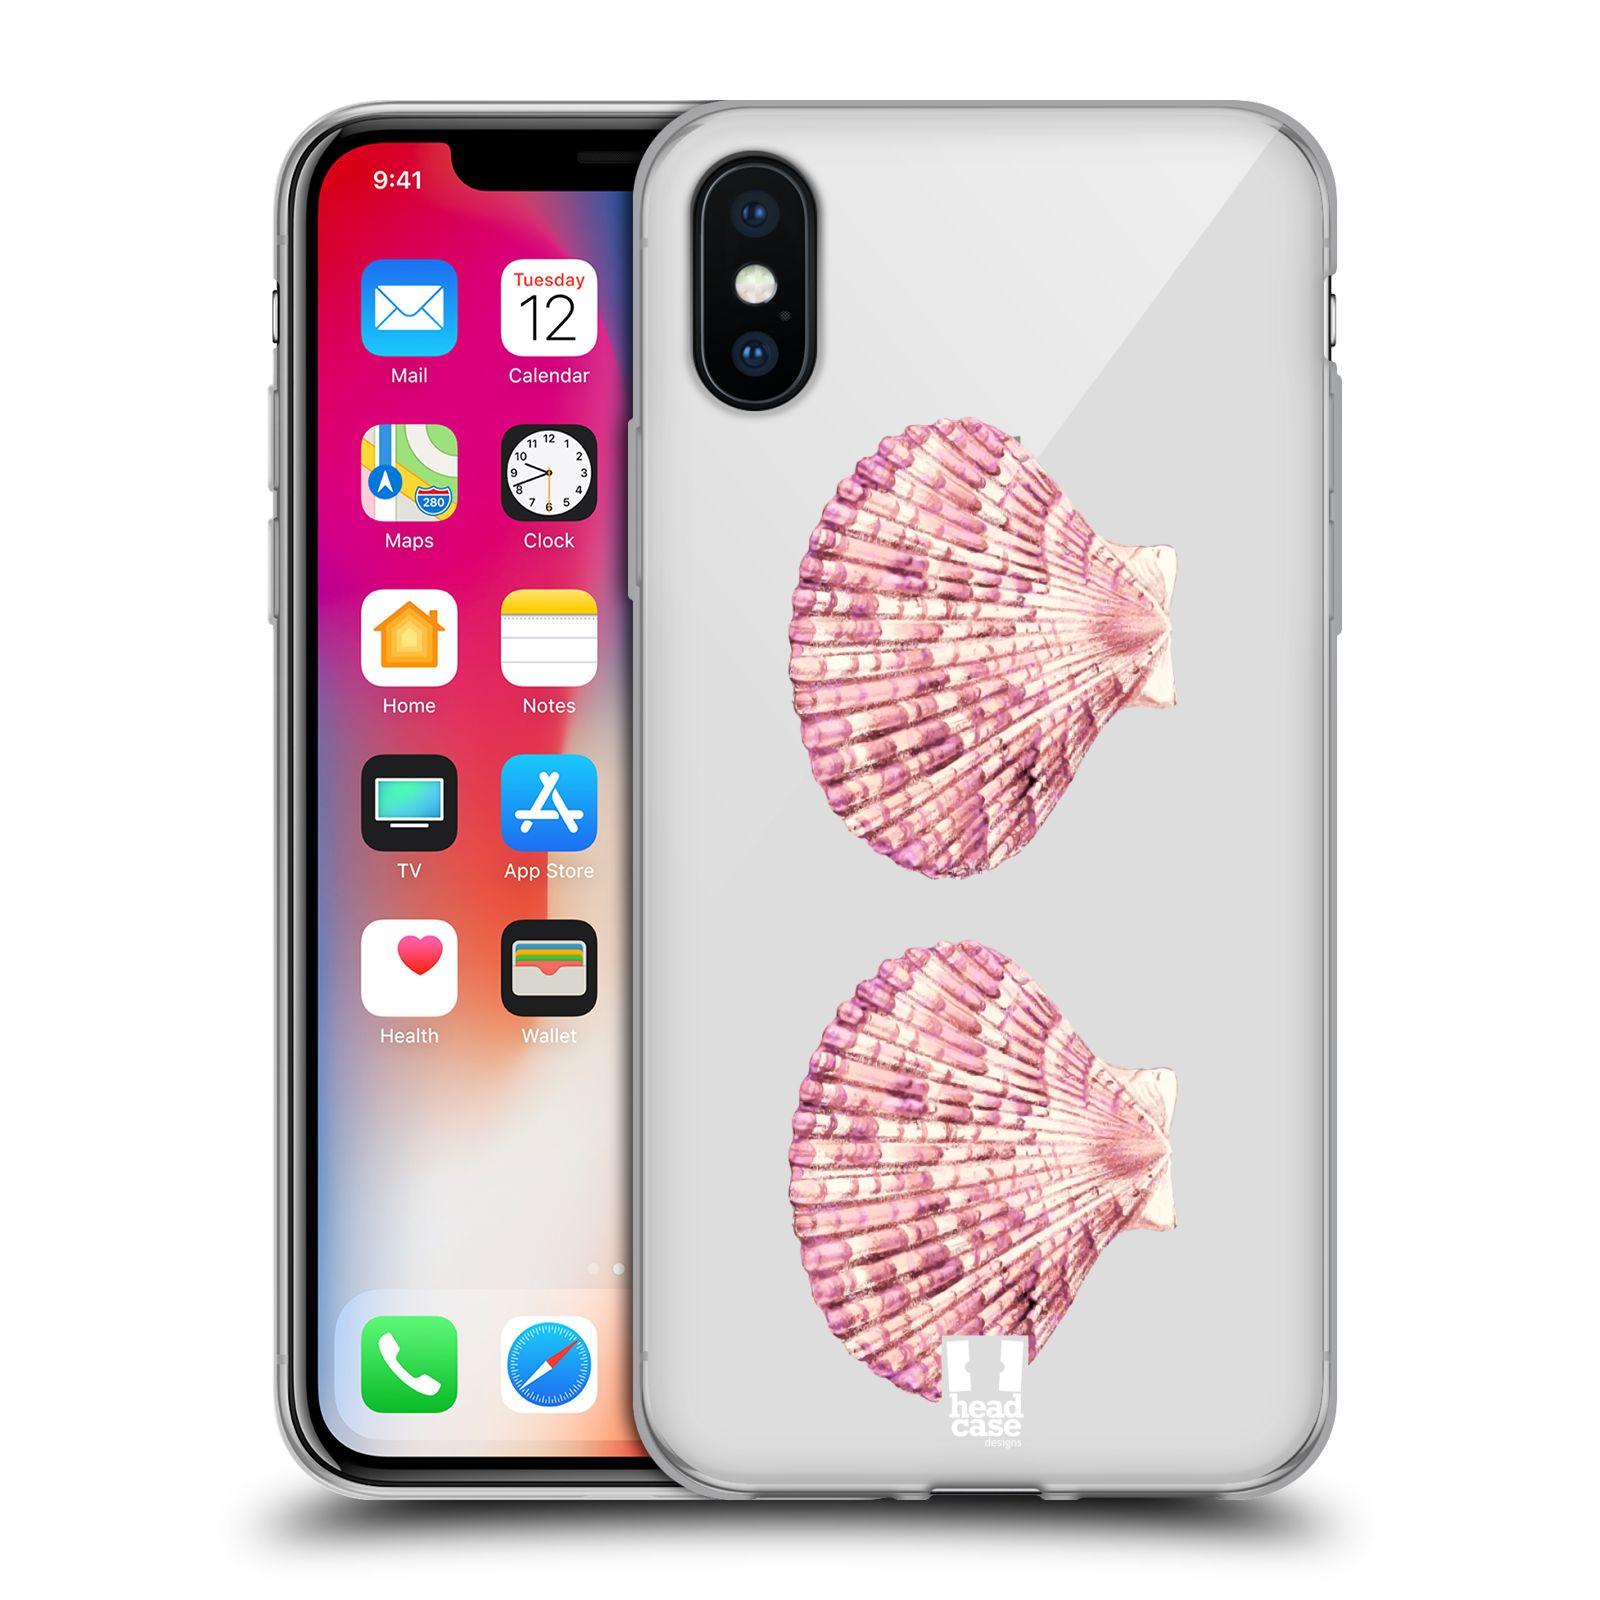 HEAD-CASE-DESIGNS-EVERYTHING-MERMAID-SOFT-GEL-CASE-FOR-APPLE-iPHONE-PHONES